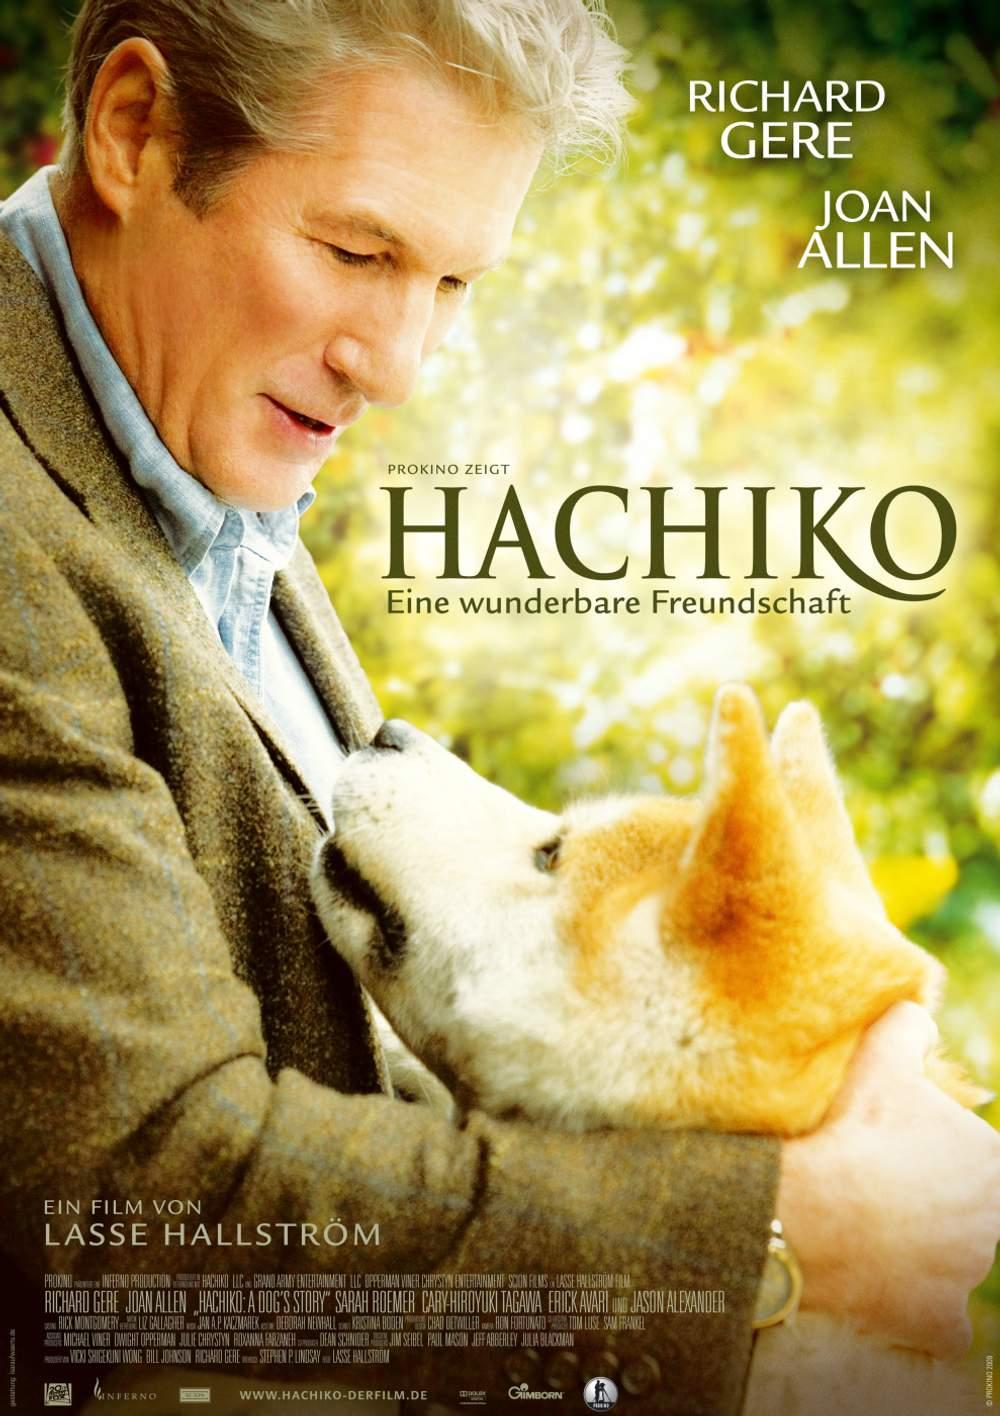 Hachiko Movie4k